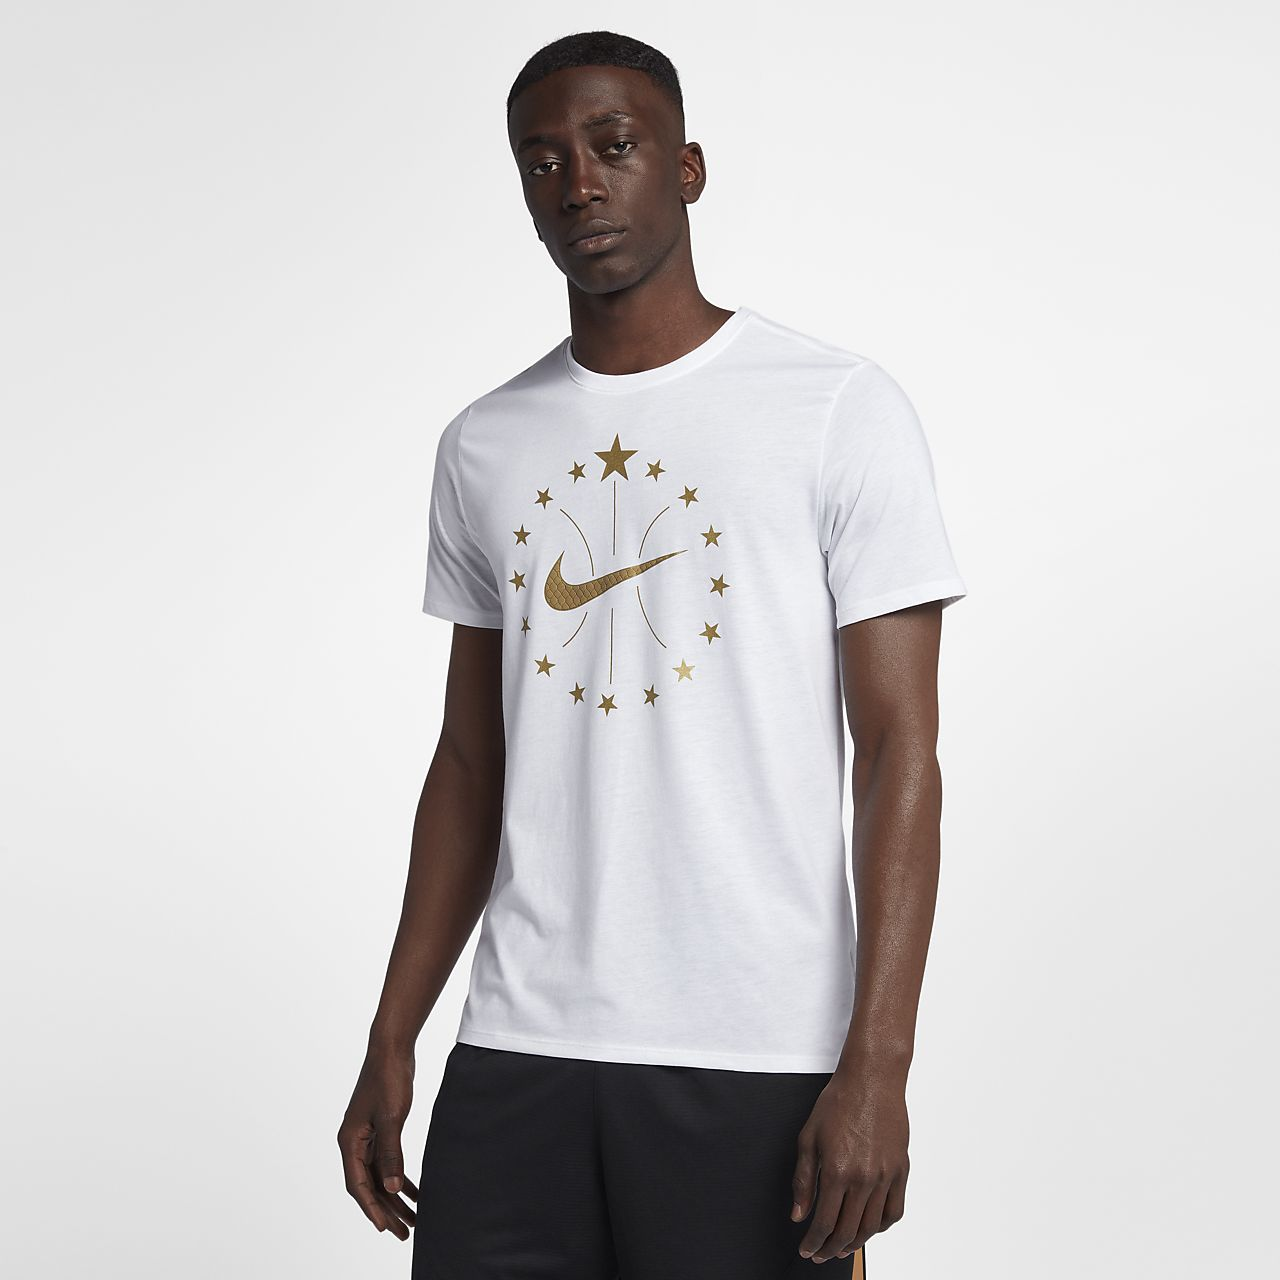 ... Nike Dri-FIT Men's Basketball T-Shirt